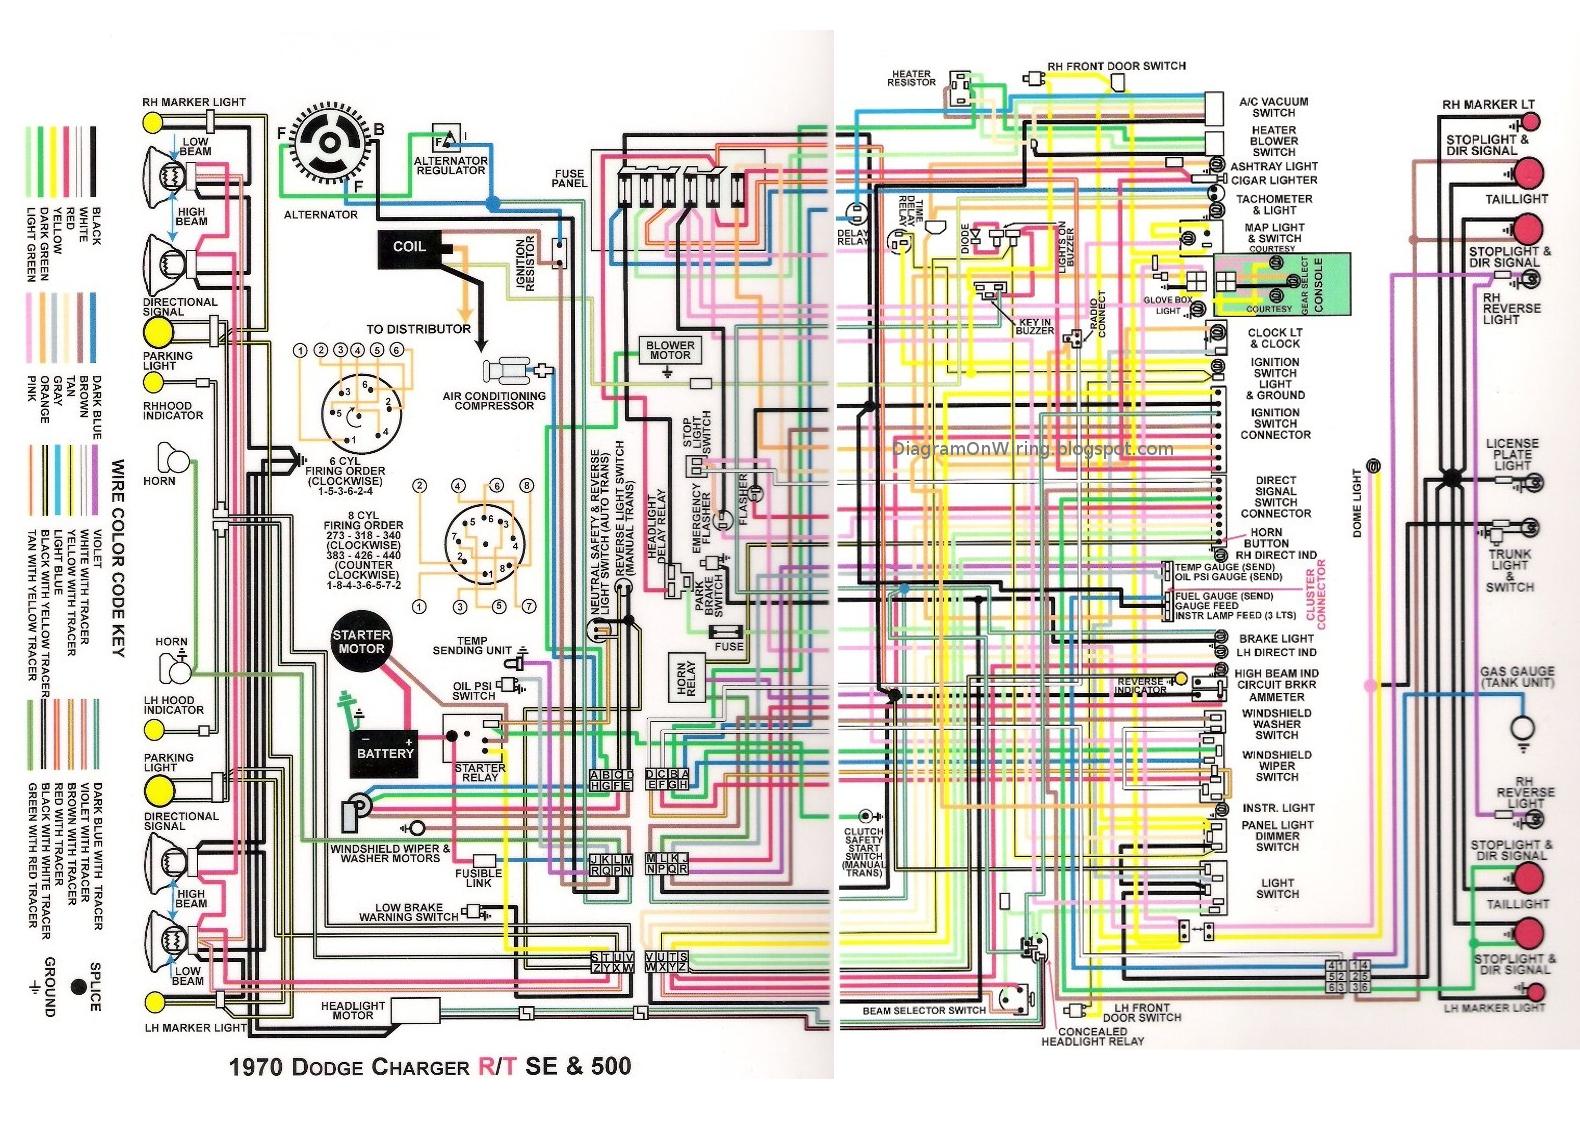 Nova Wiper Motor Wiring Diagram Auto Electrical 1964 Impala Heater Parts